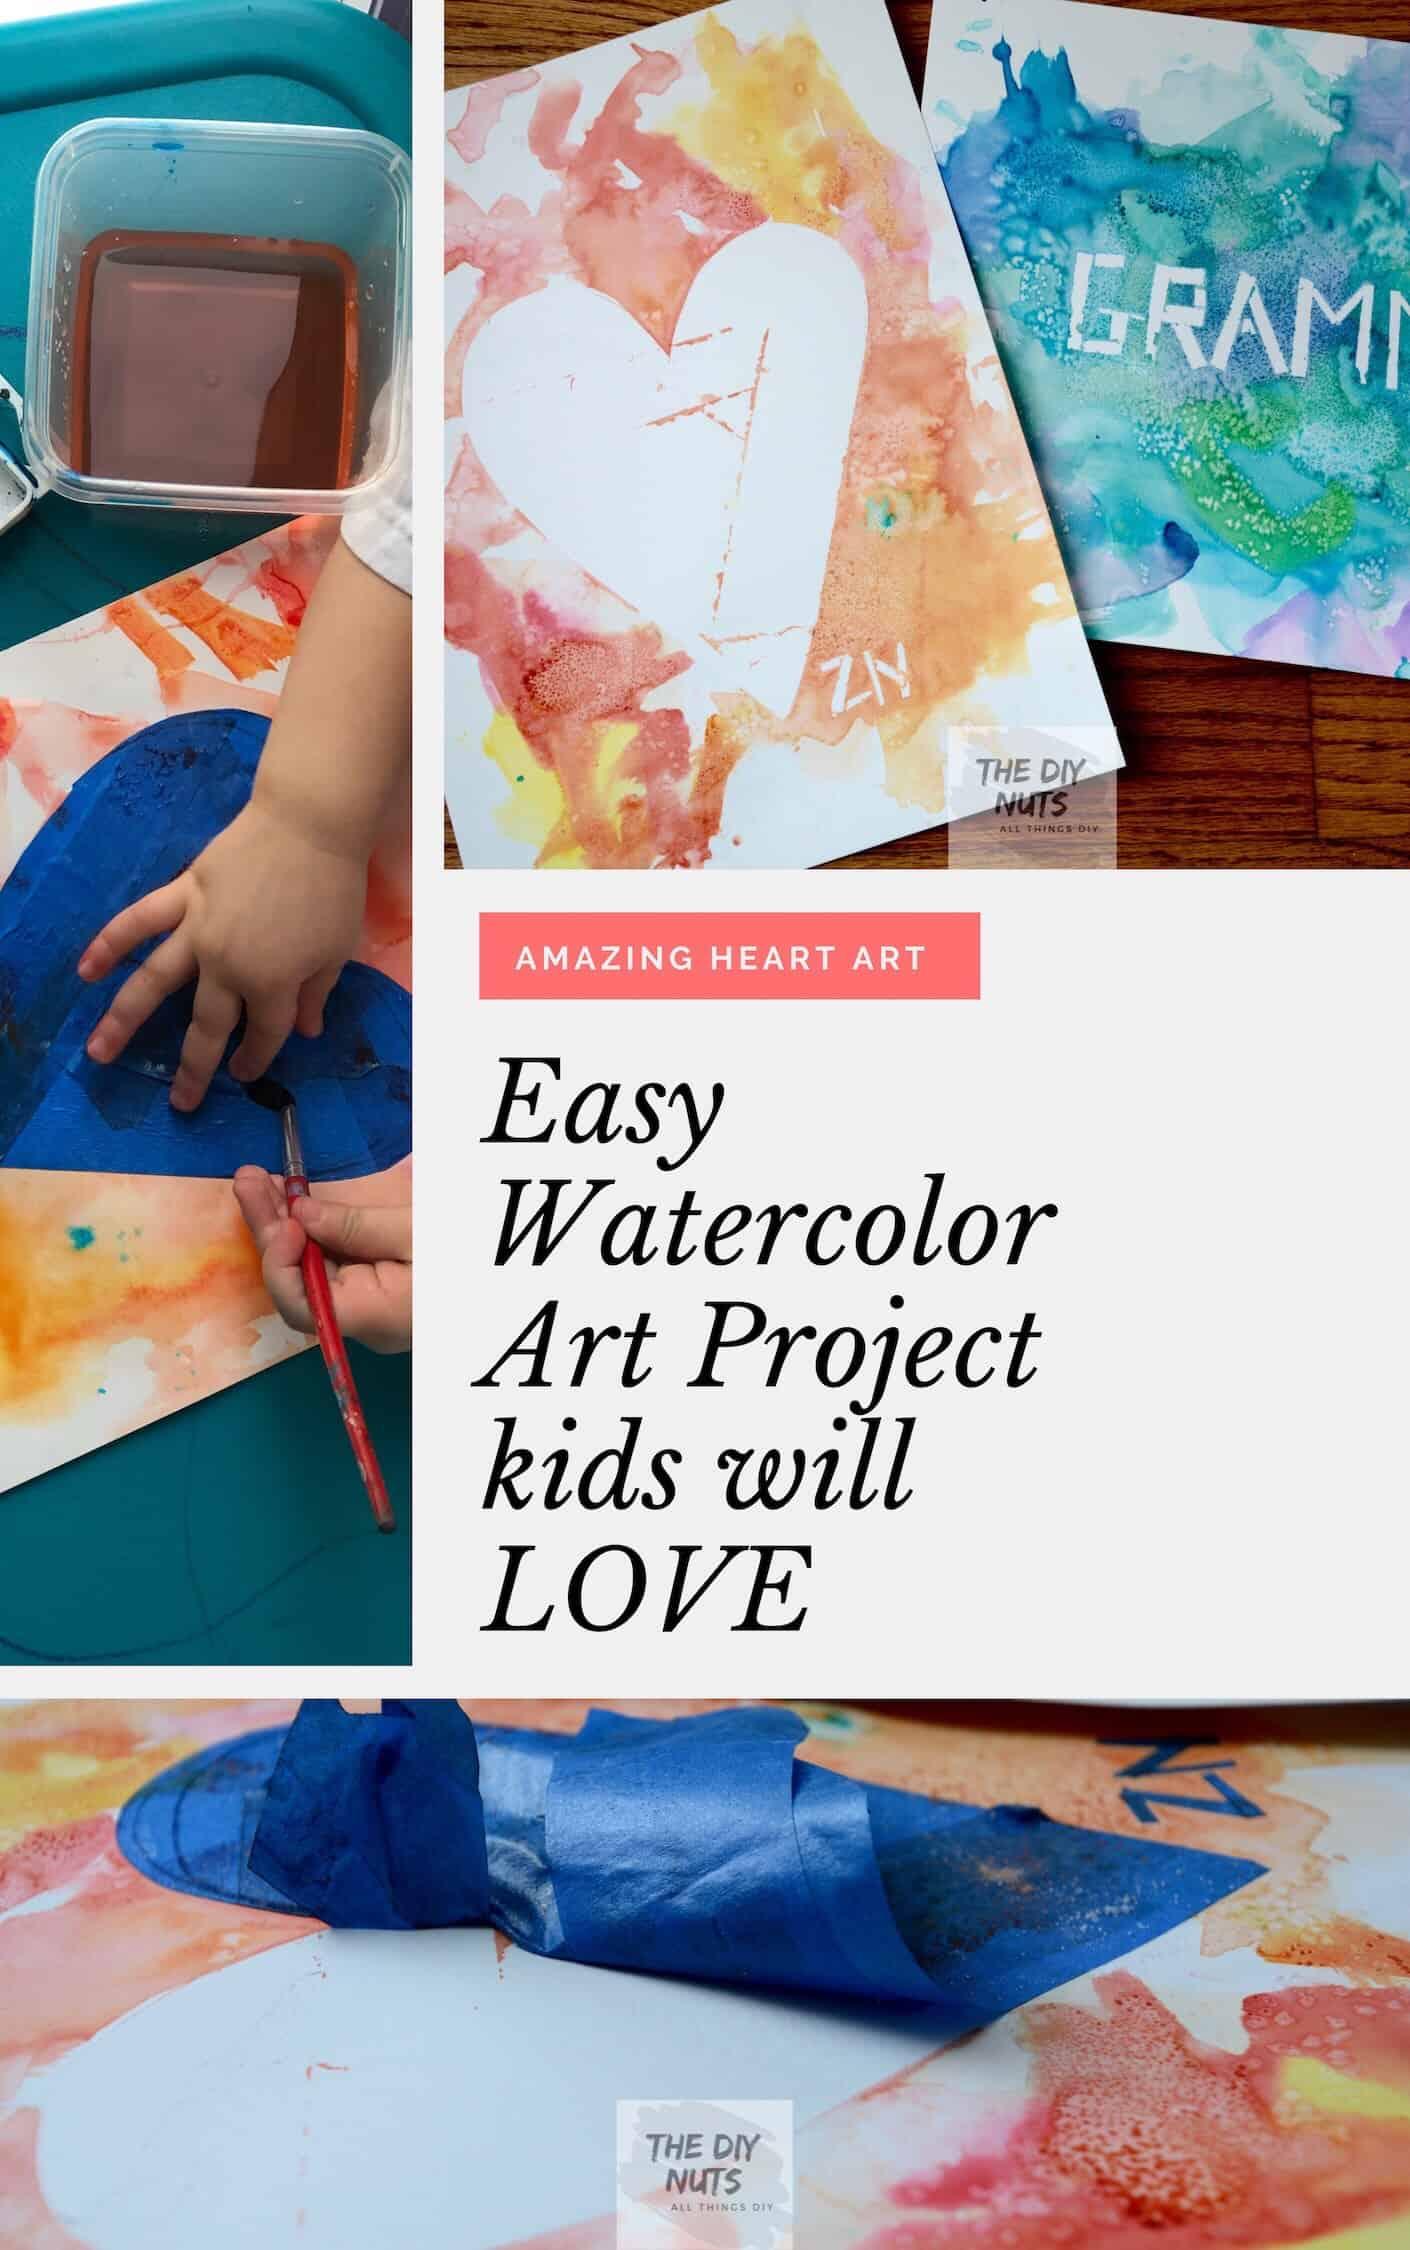 Easy Watercolor Art Project Kids Will Love Heart Art The